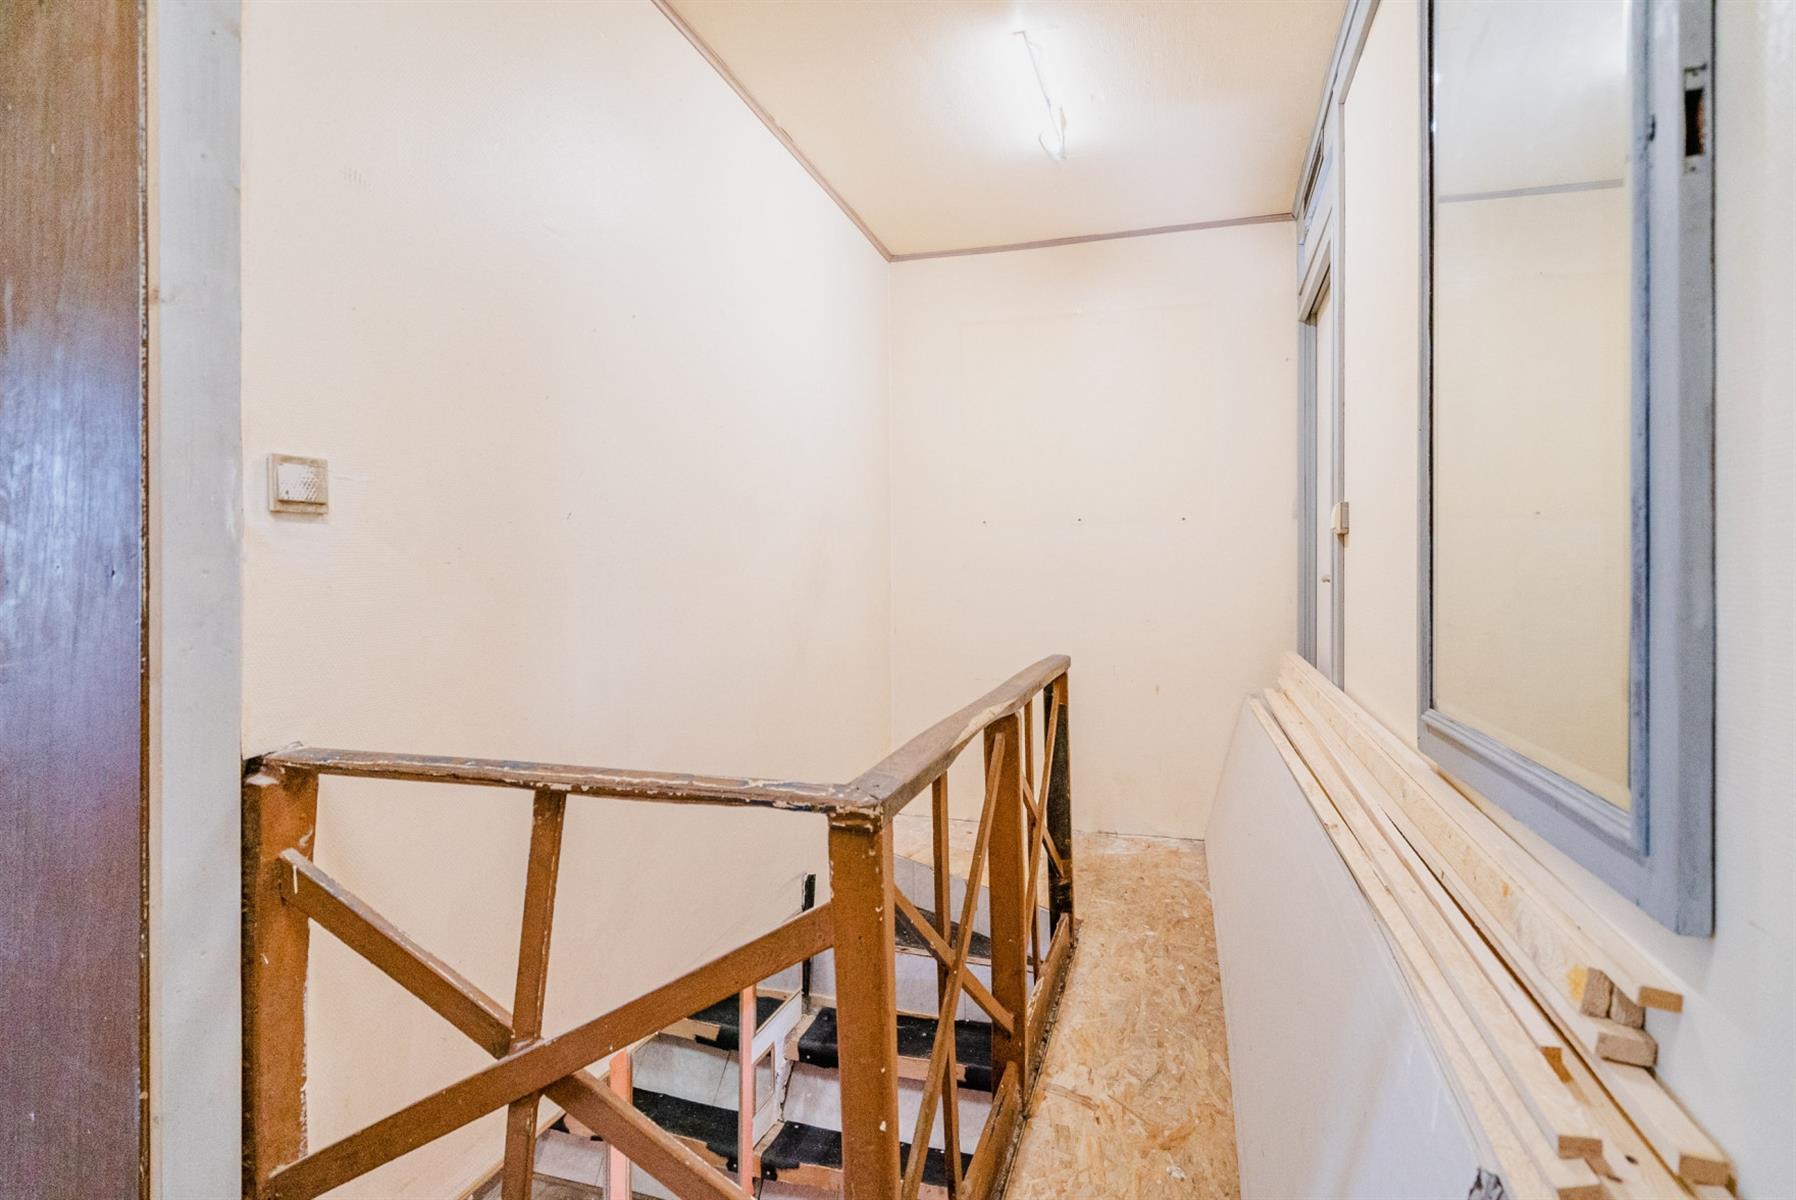 Maison - Oupeye Hermallesous-Argenteau - #4324098-8